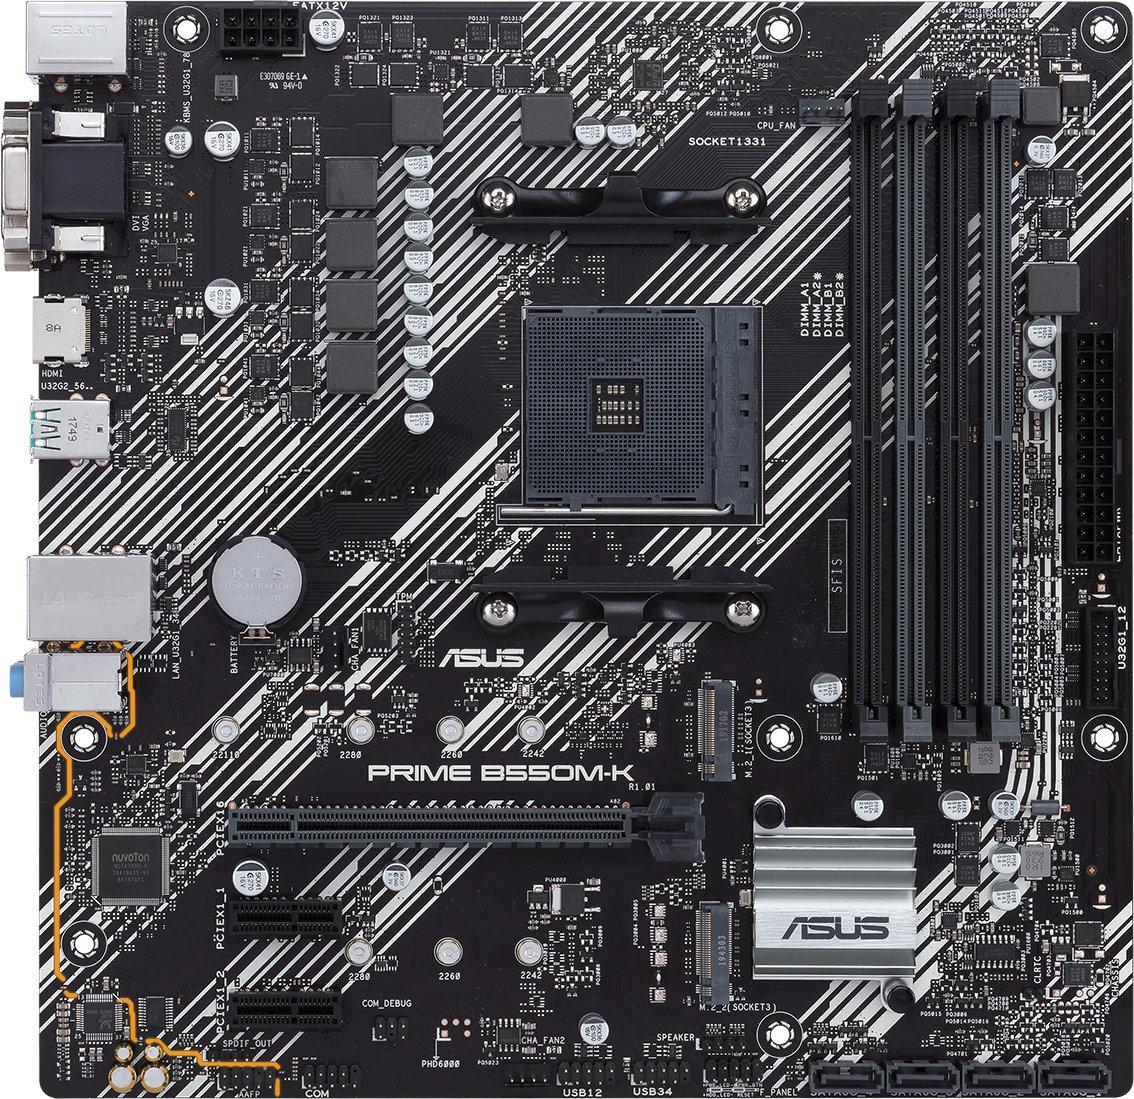 Дънна платка ASUS Prime B550M-K socket AM4, 4xDDR4, PCIe 4.0, Dual M.2